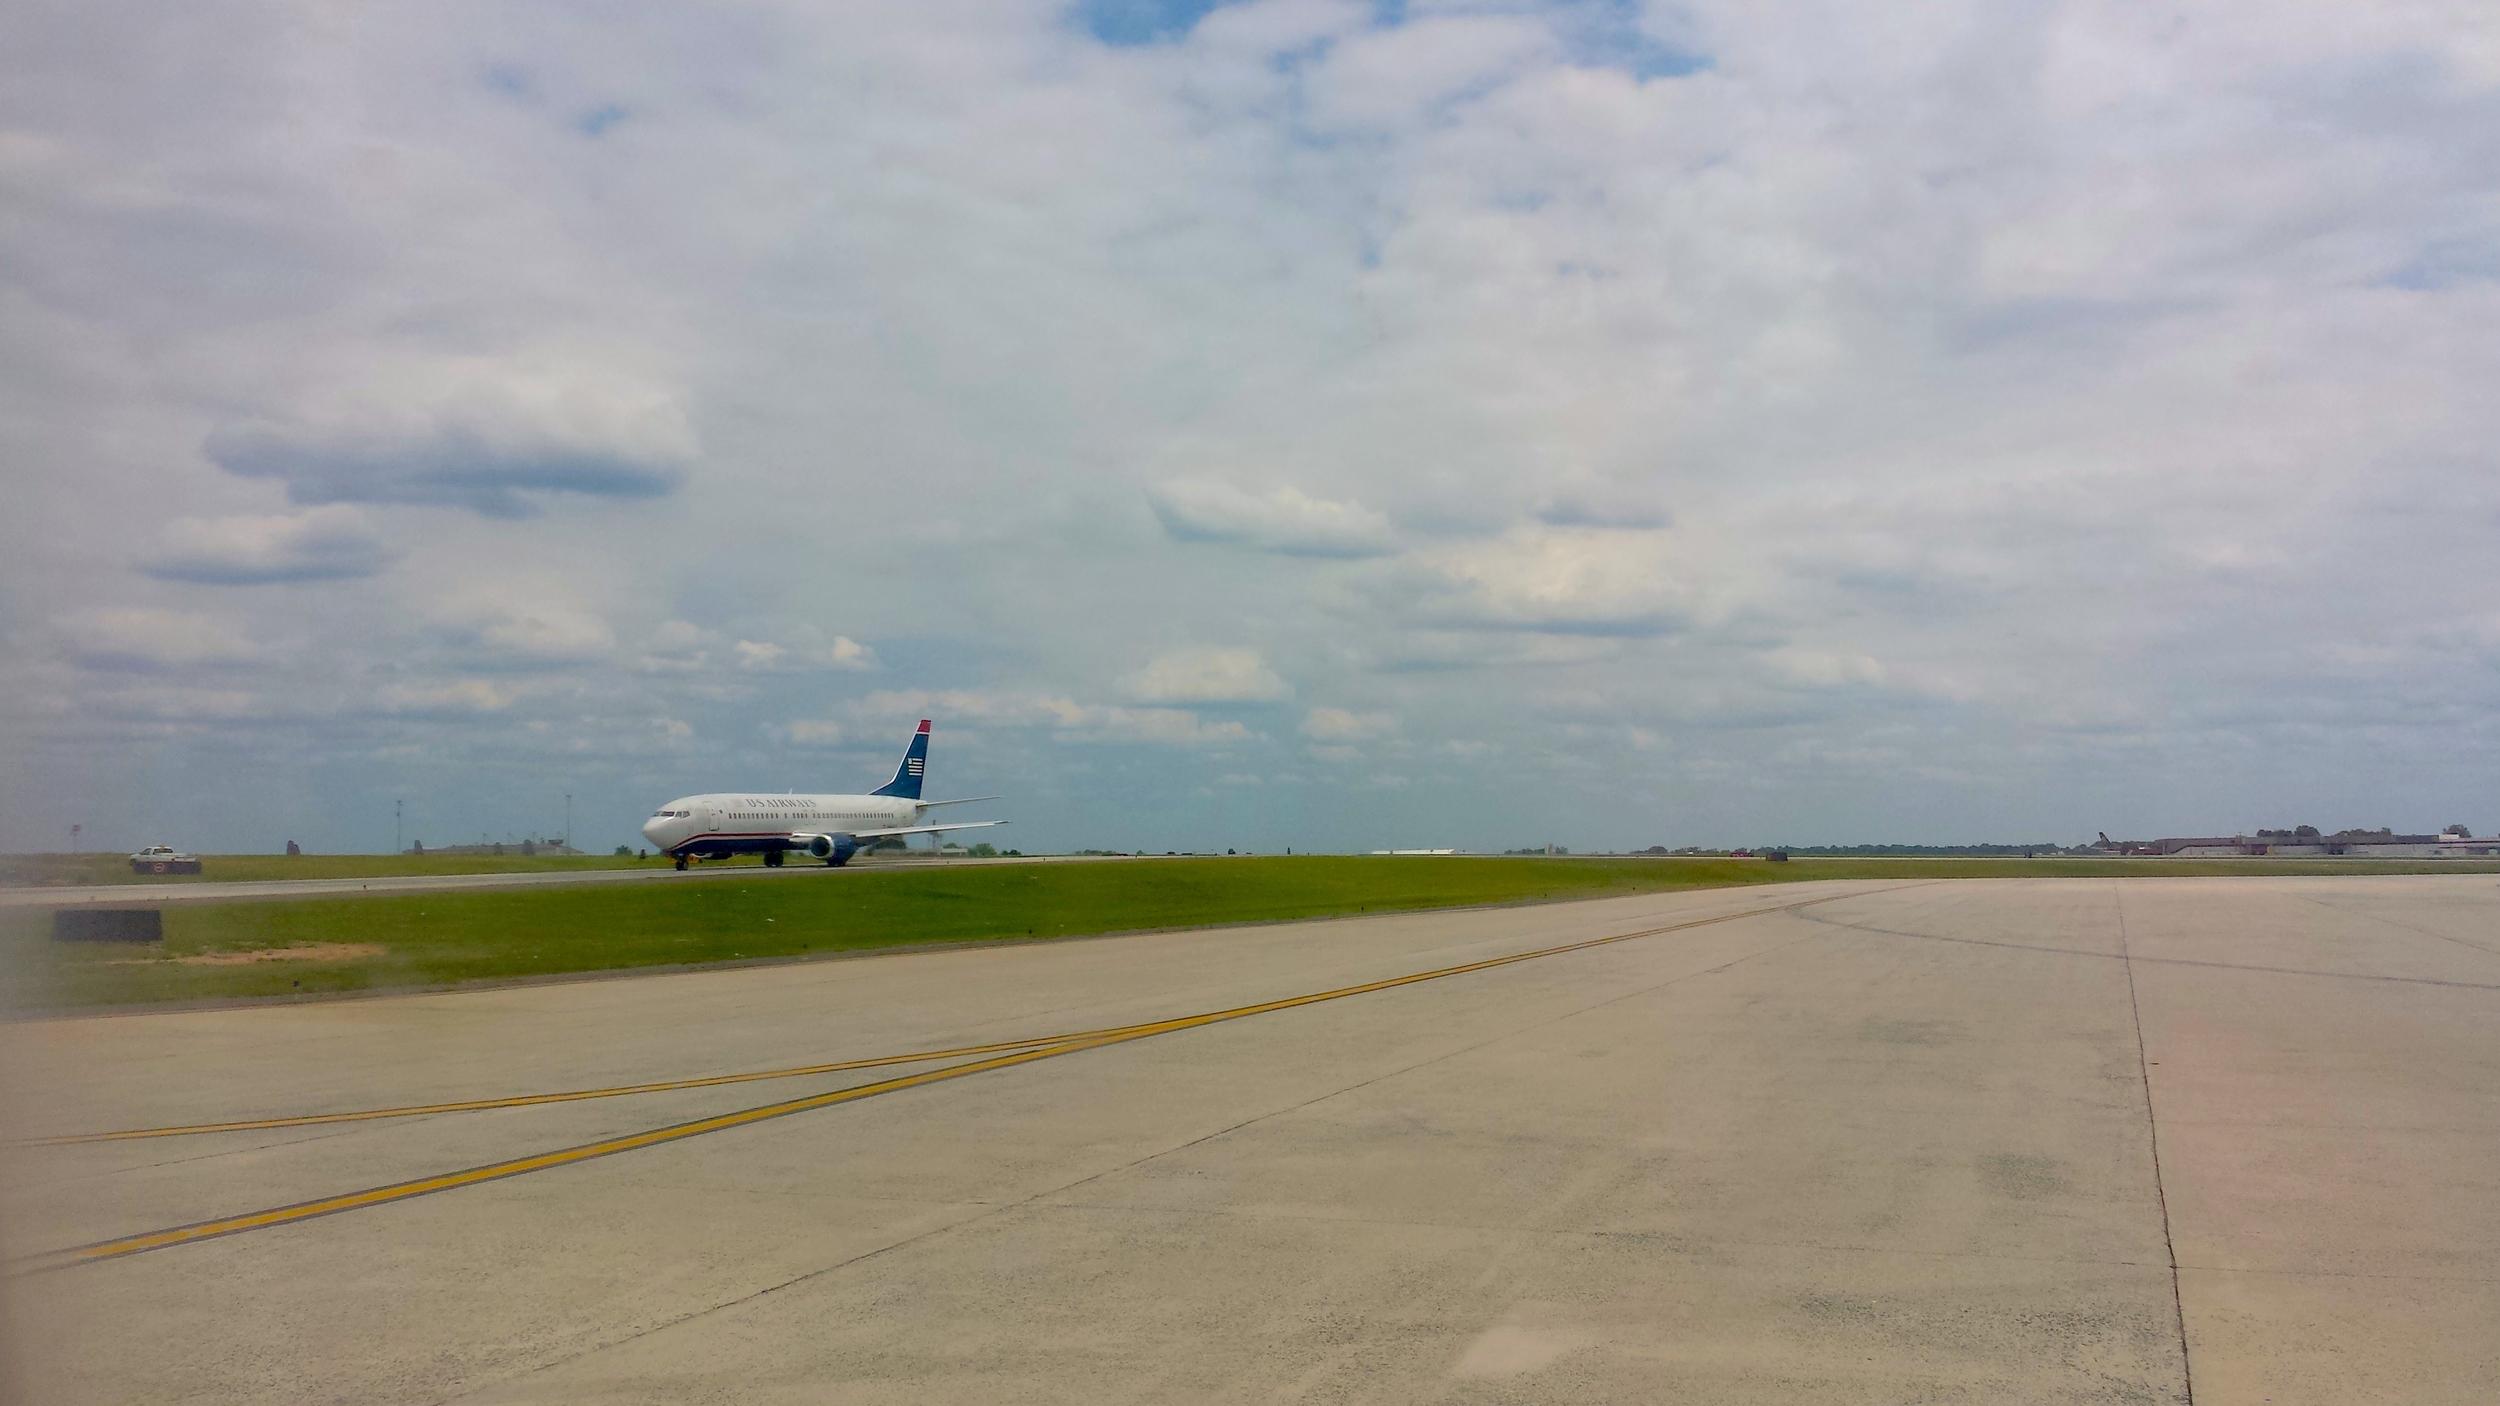 Coastal Carolina Regional Airport: New Bern, NC